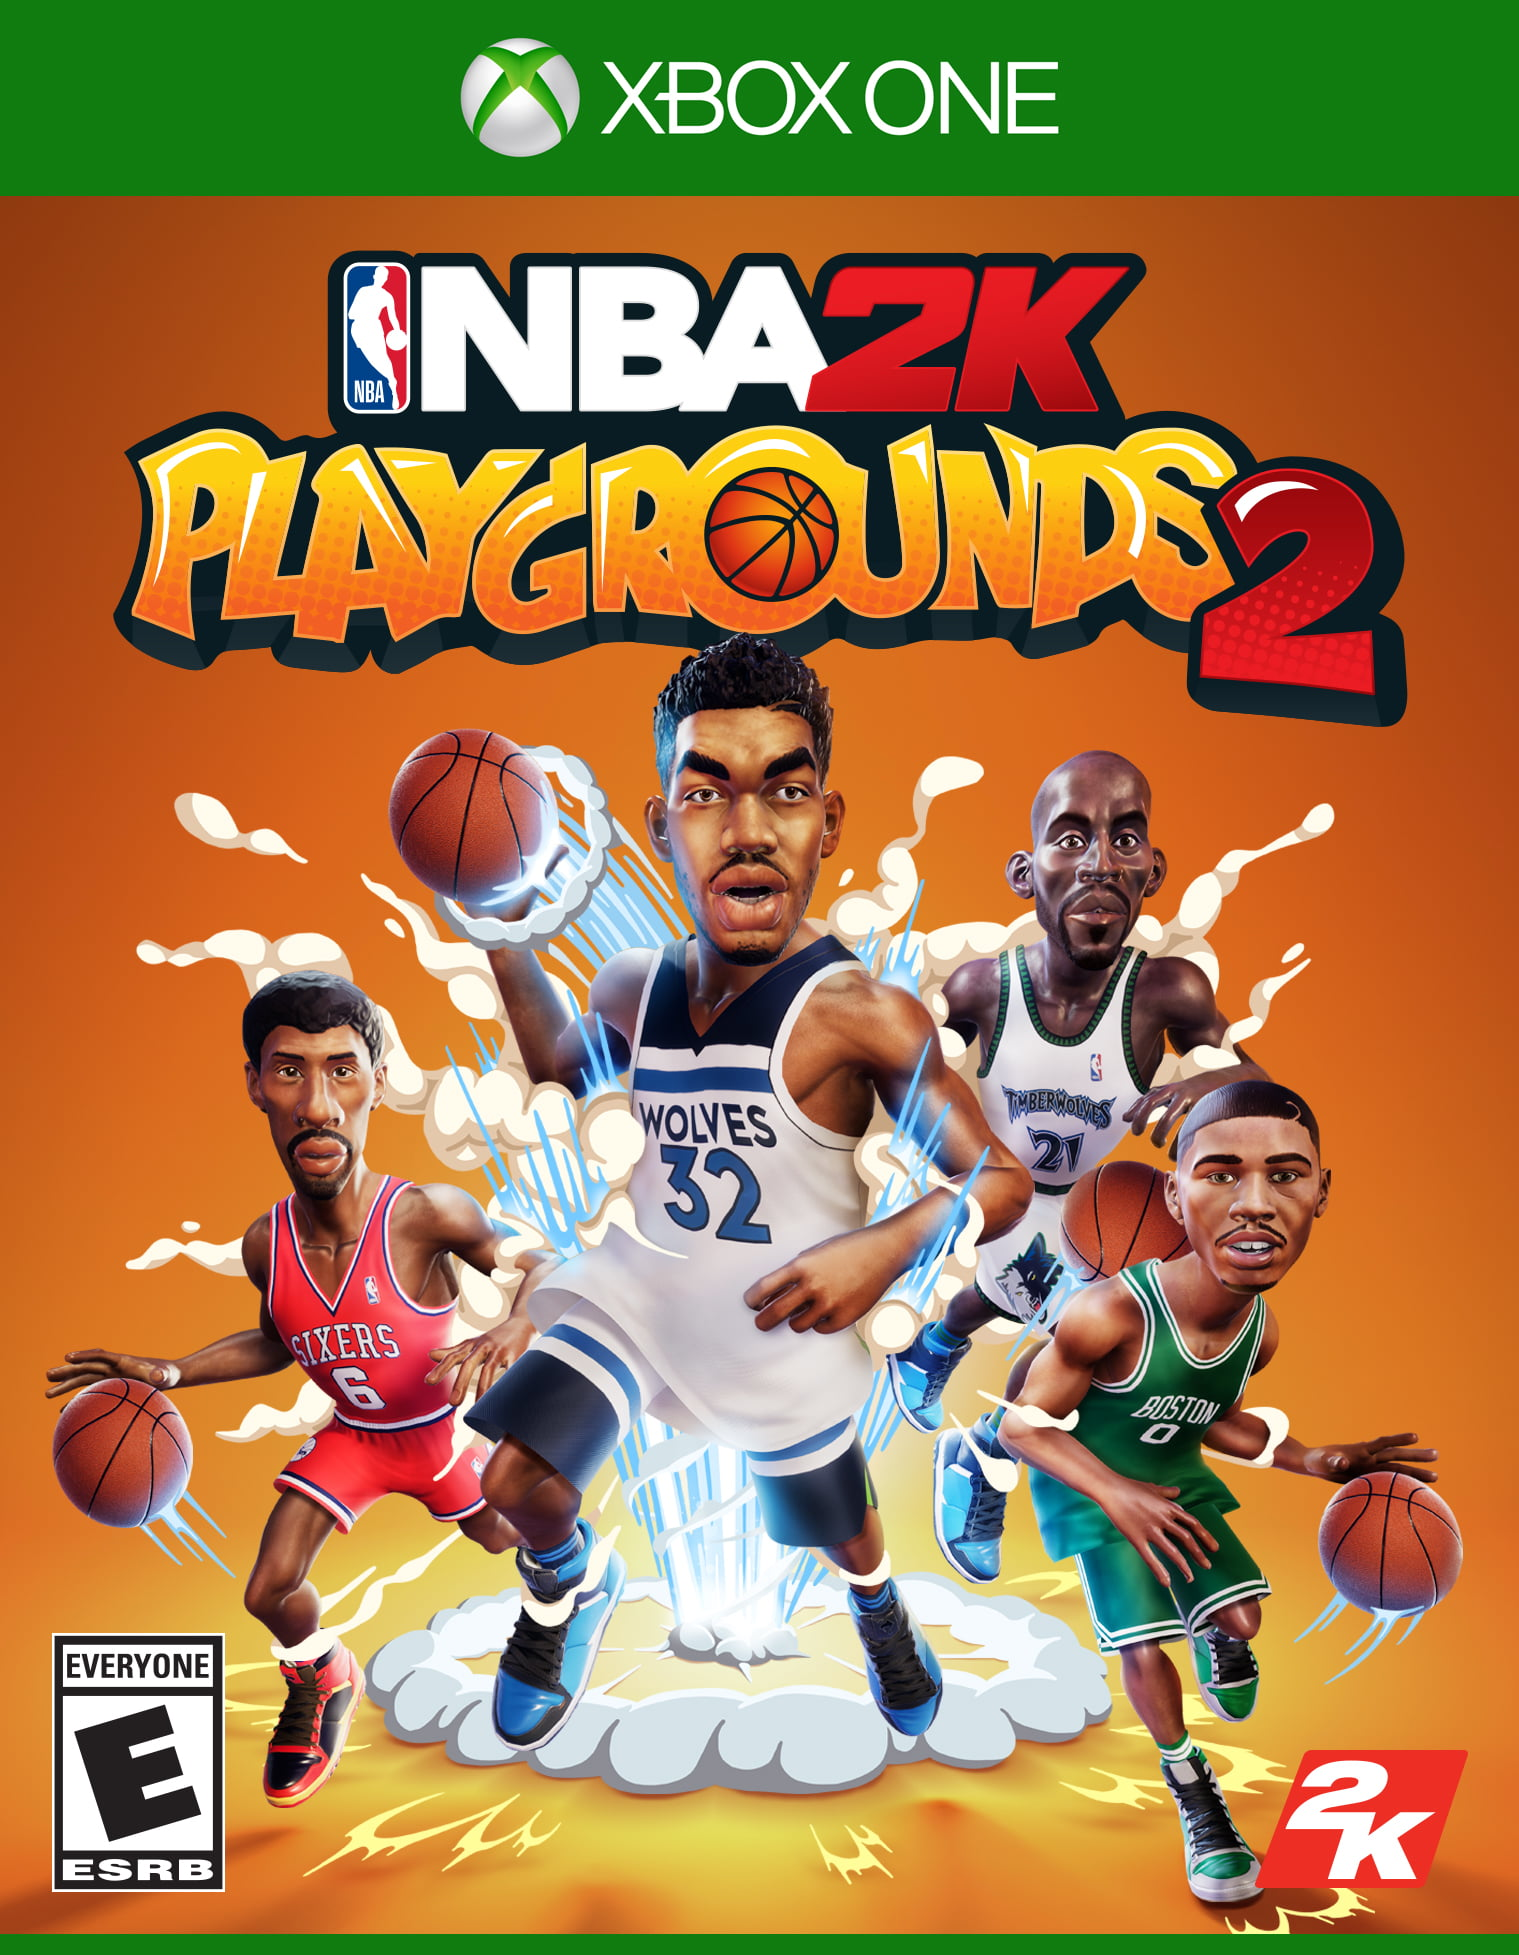 NBA 2K Playgrounds 2, 2K, Xbox One, 710425593628